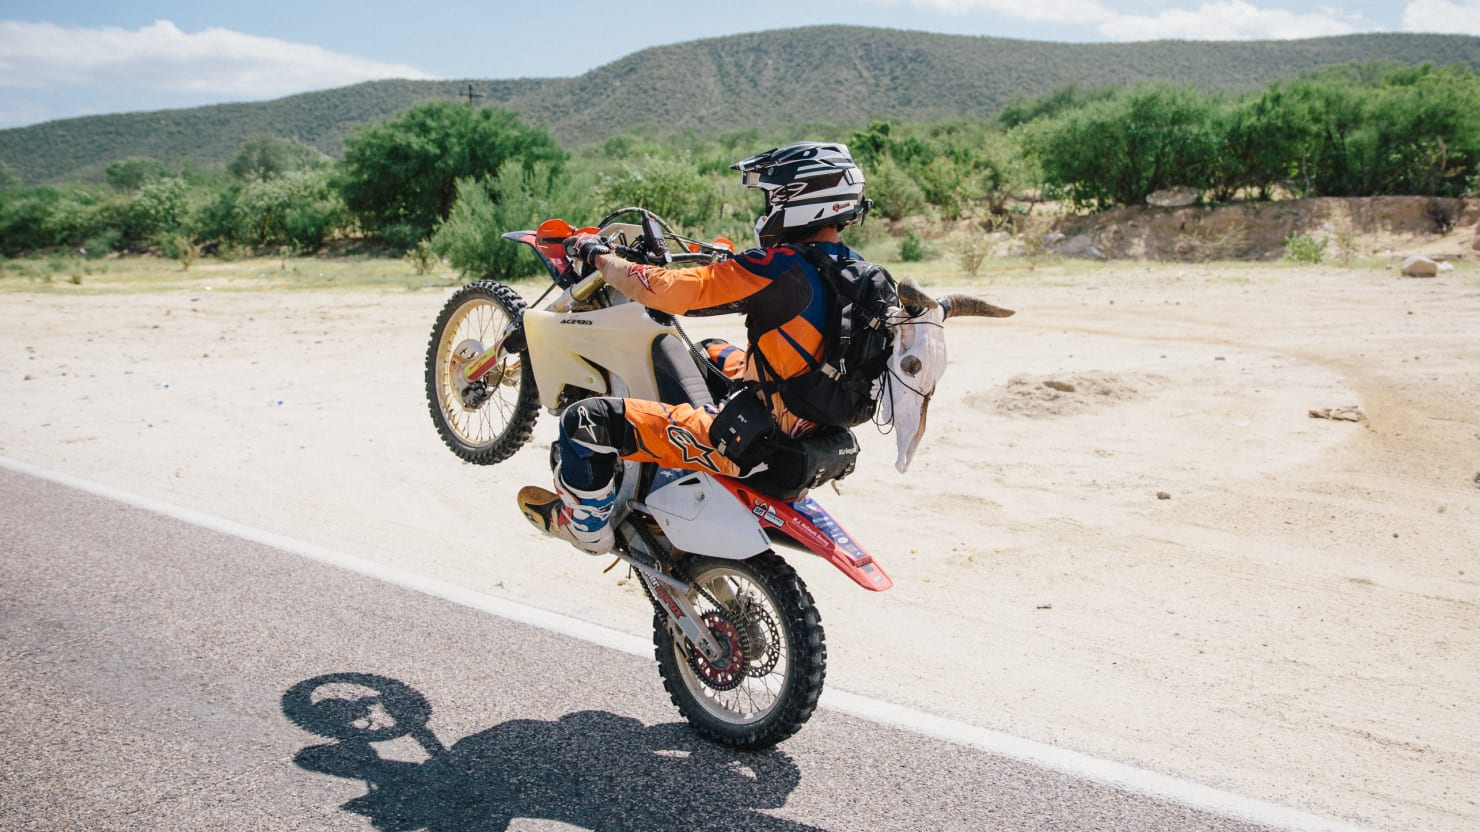 Retracing the Notorious Baja 1000